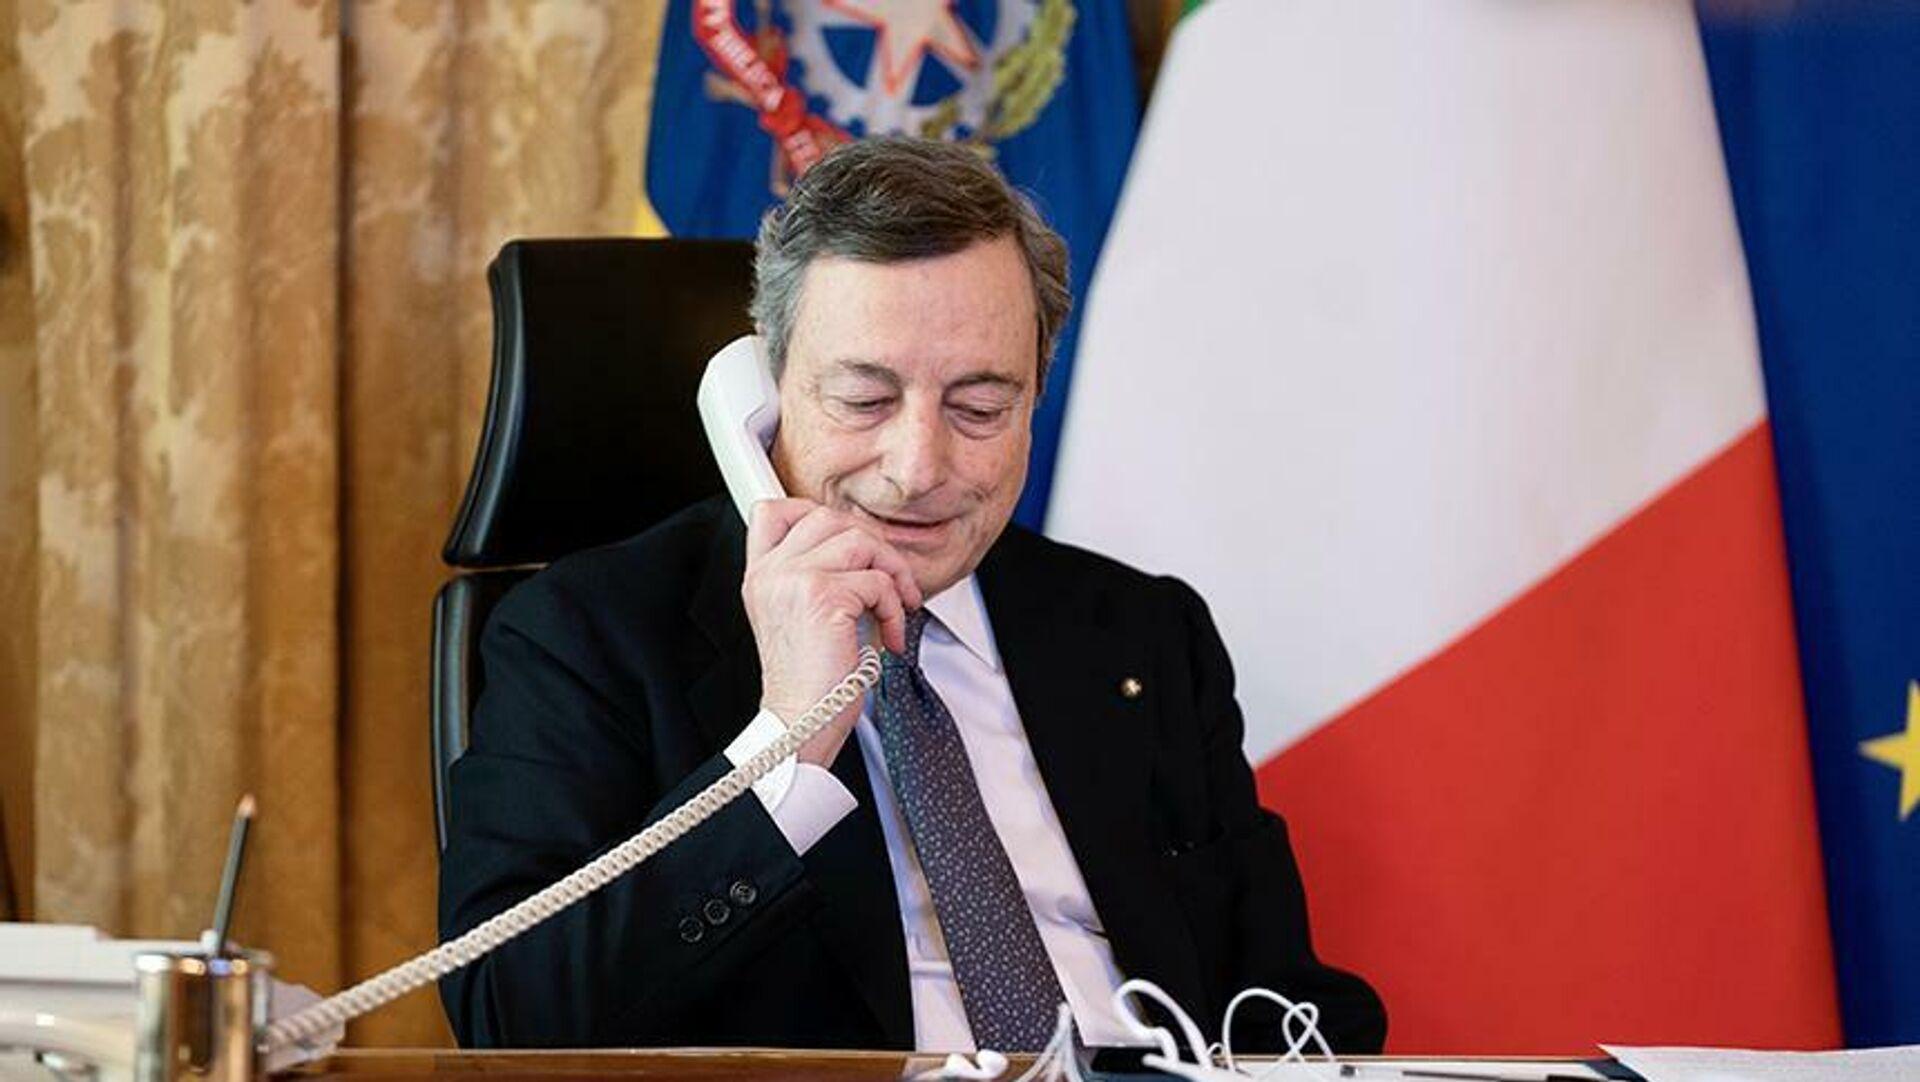 Il premier Draghi al telefono - Sputnik Italia, 1920, 07.09.2021